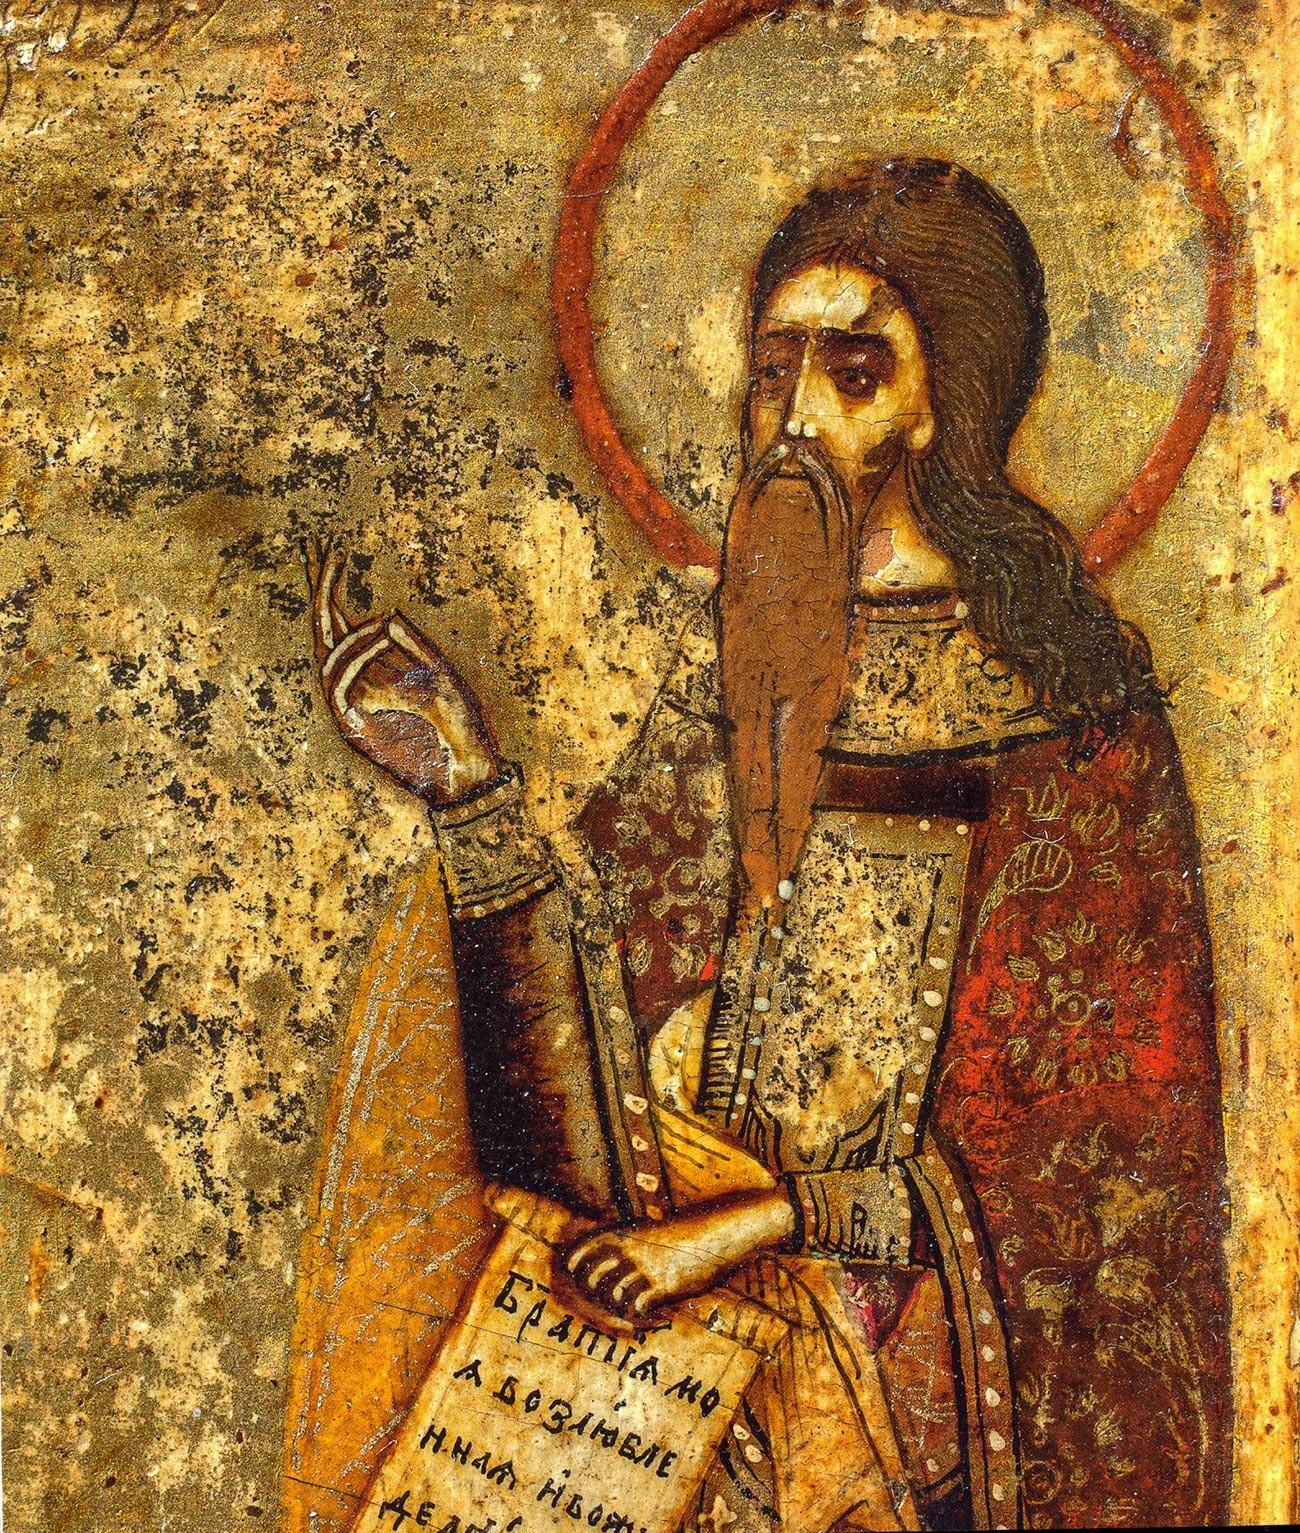 Awwakum Petrow, der Führer der Altgläubigen im 17. Jahrhundert